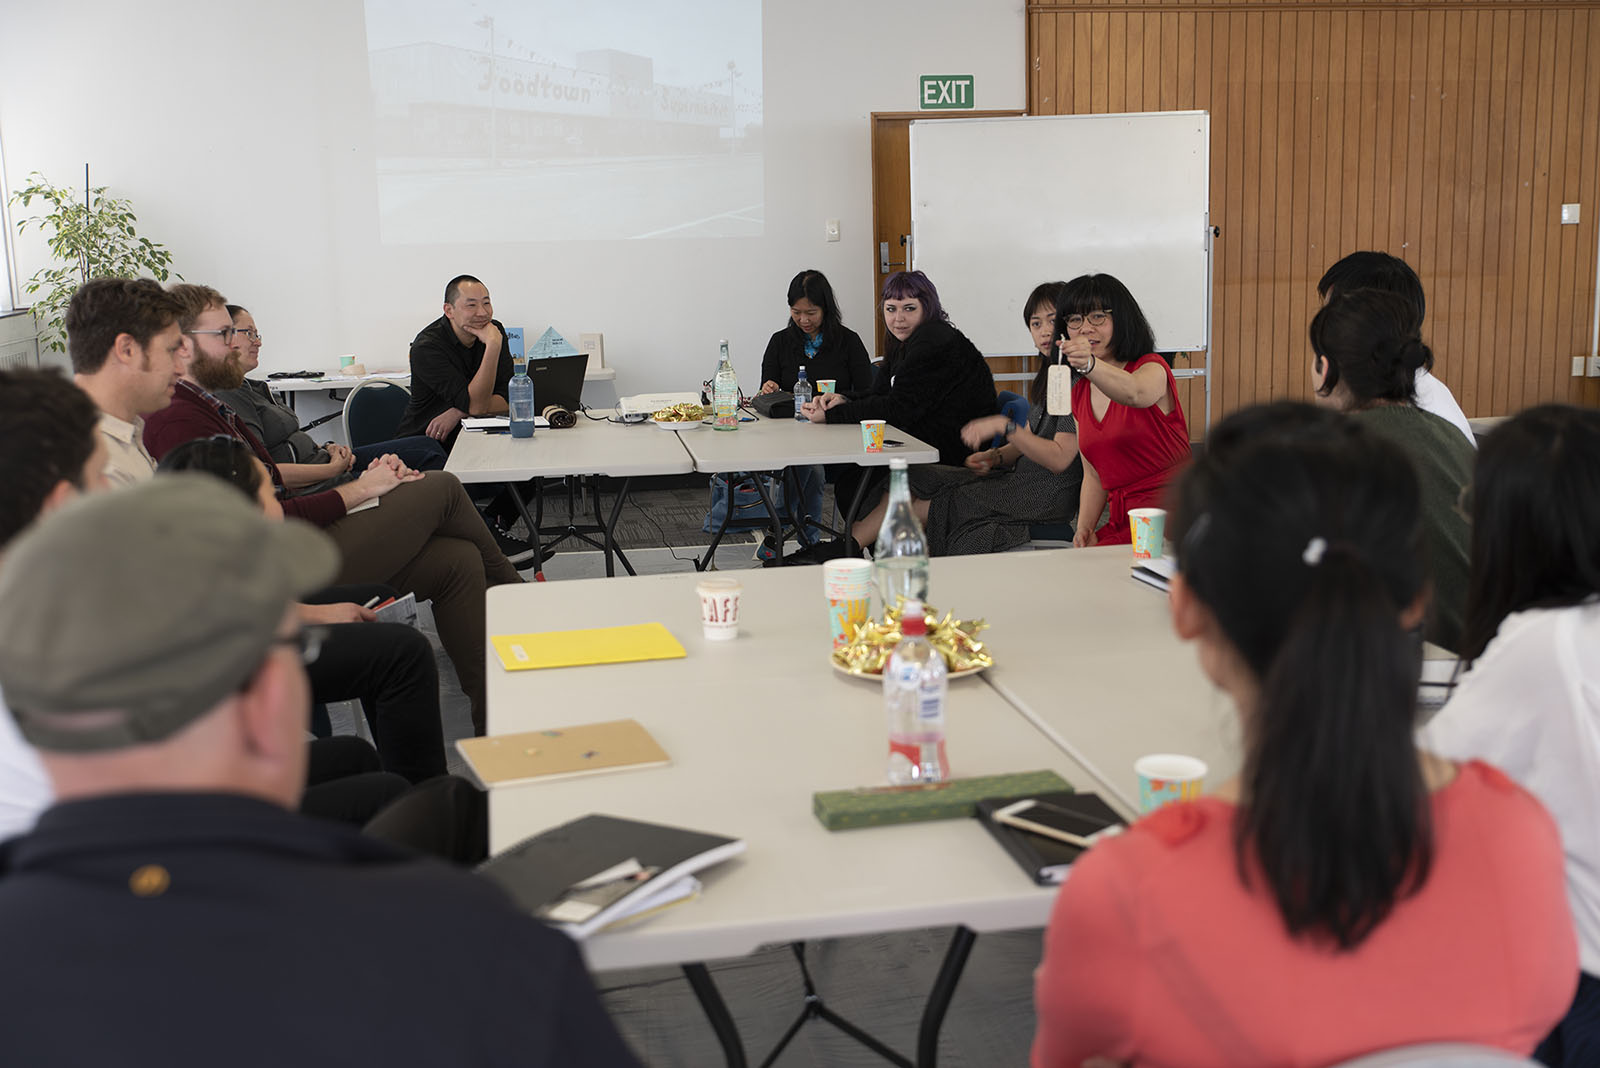 Master Class #3 with Ant Sang, Massey University, 21 September 2018. Photo by John Lake